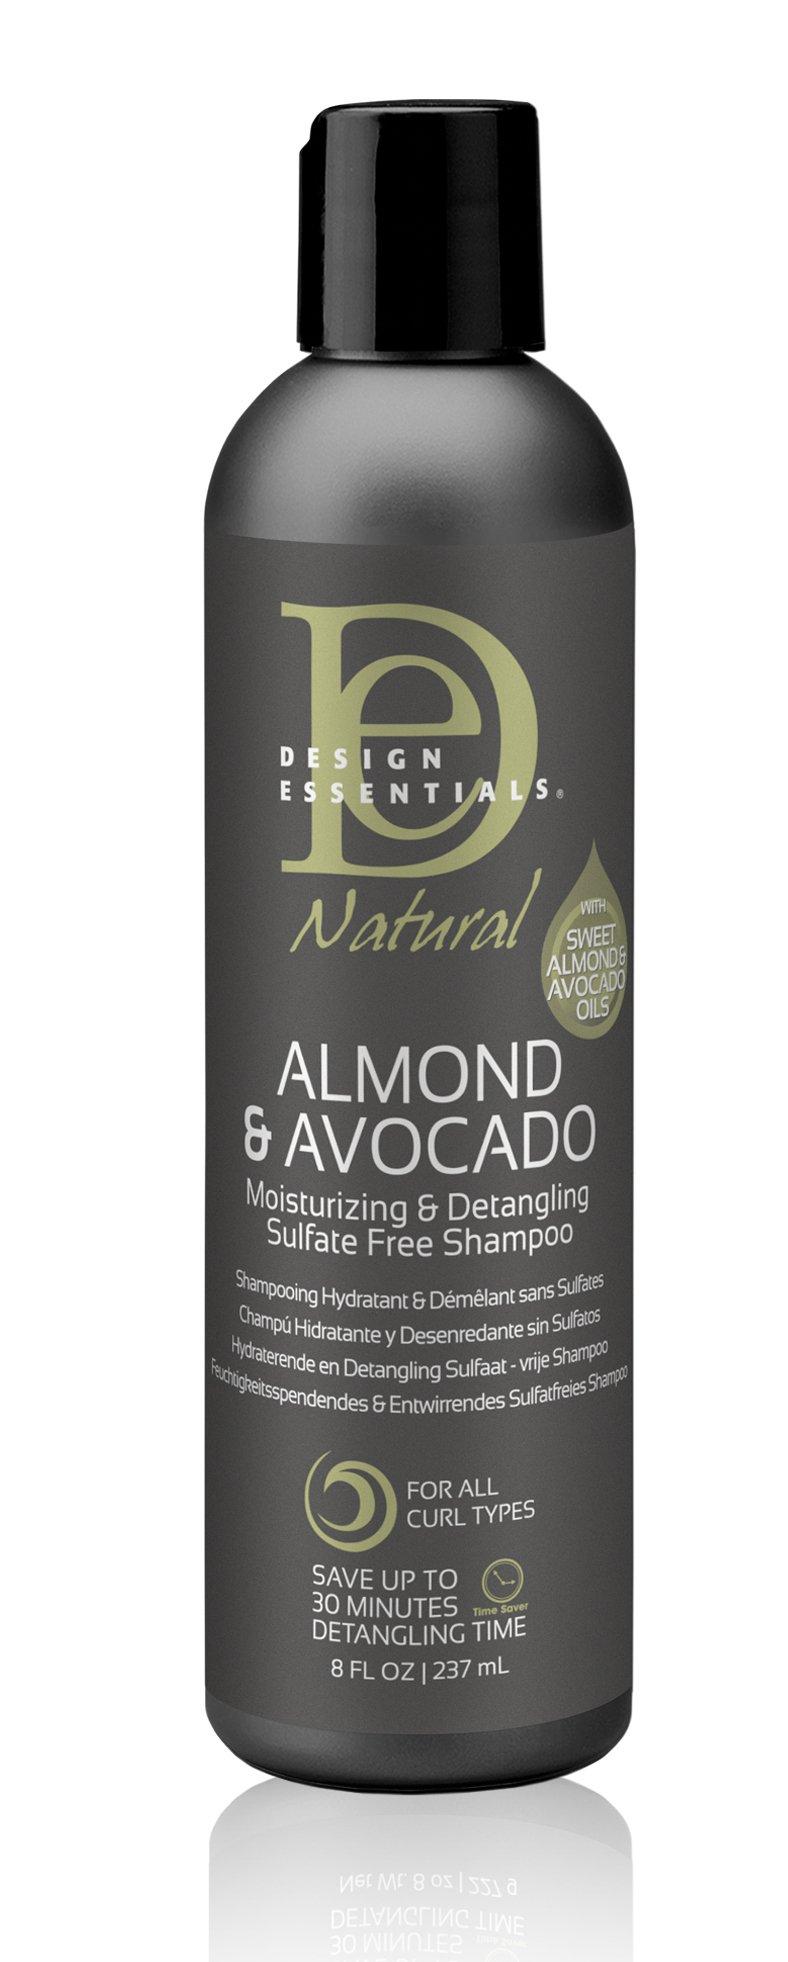 Design Essentials Natural Super Moisturizing & Detangling Sulfate- Free Shampoo- Almond & Avocado Collection 8oz.